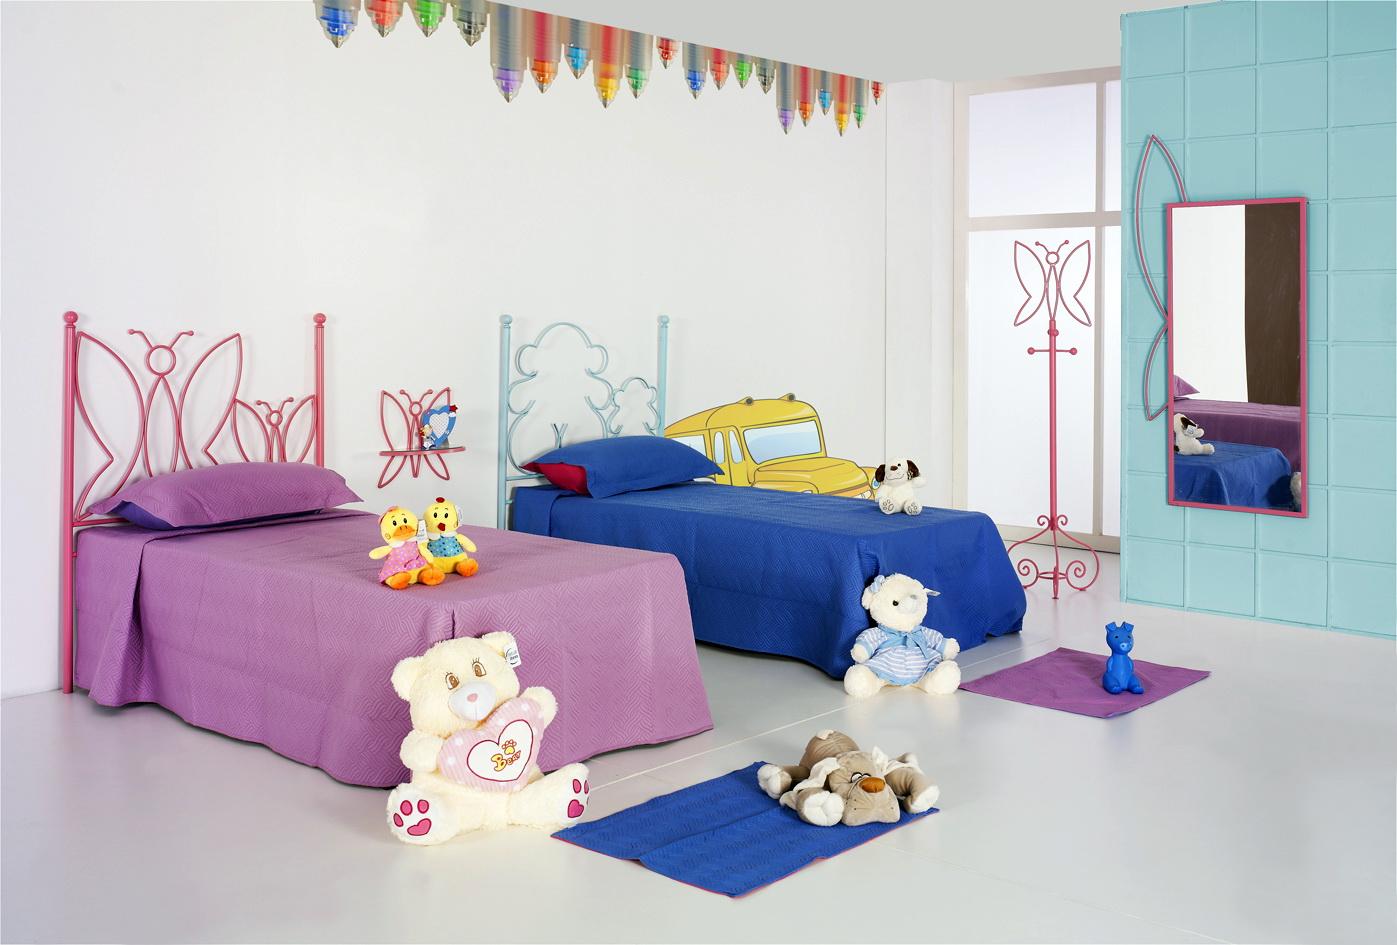 Ifex Dormitorio Infantil En Forja Muebles Anto N # Jayso Muebles De Forja